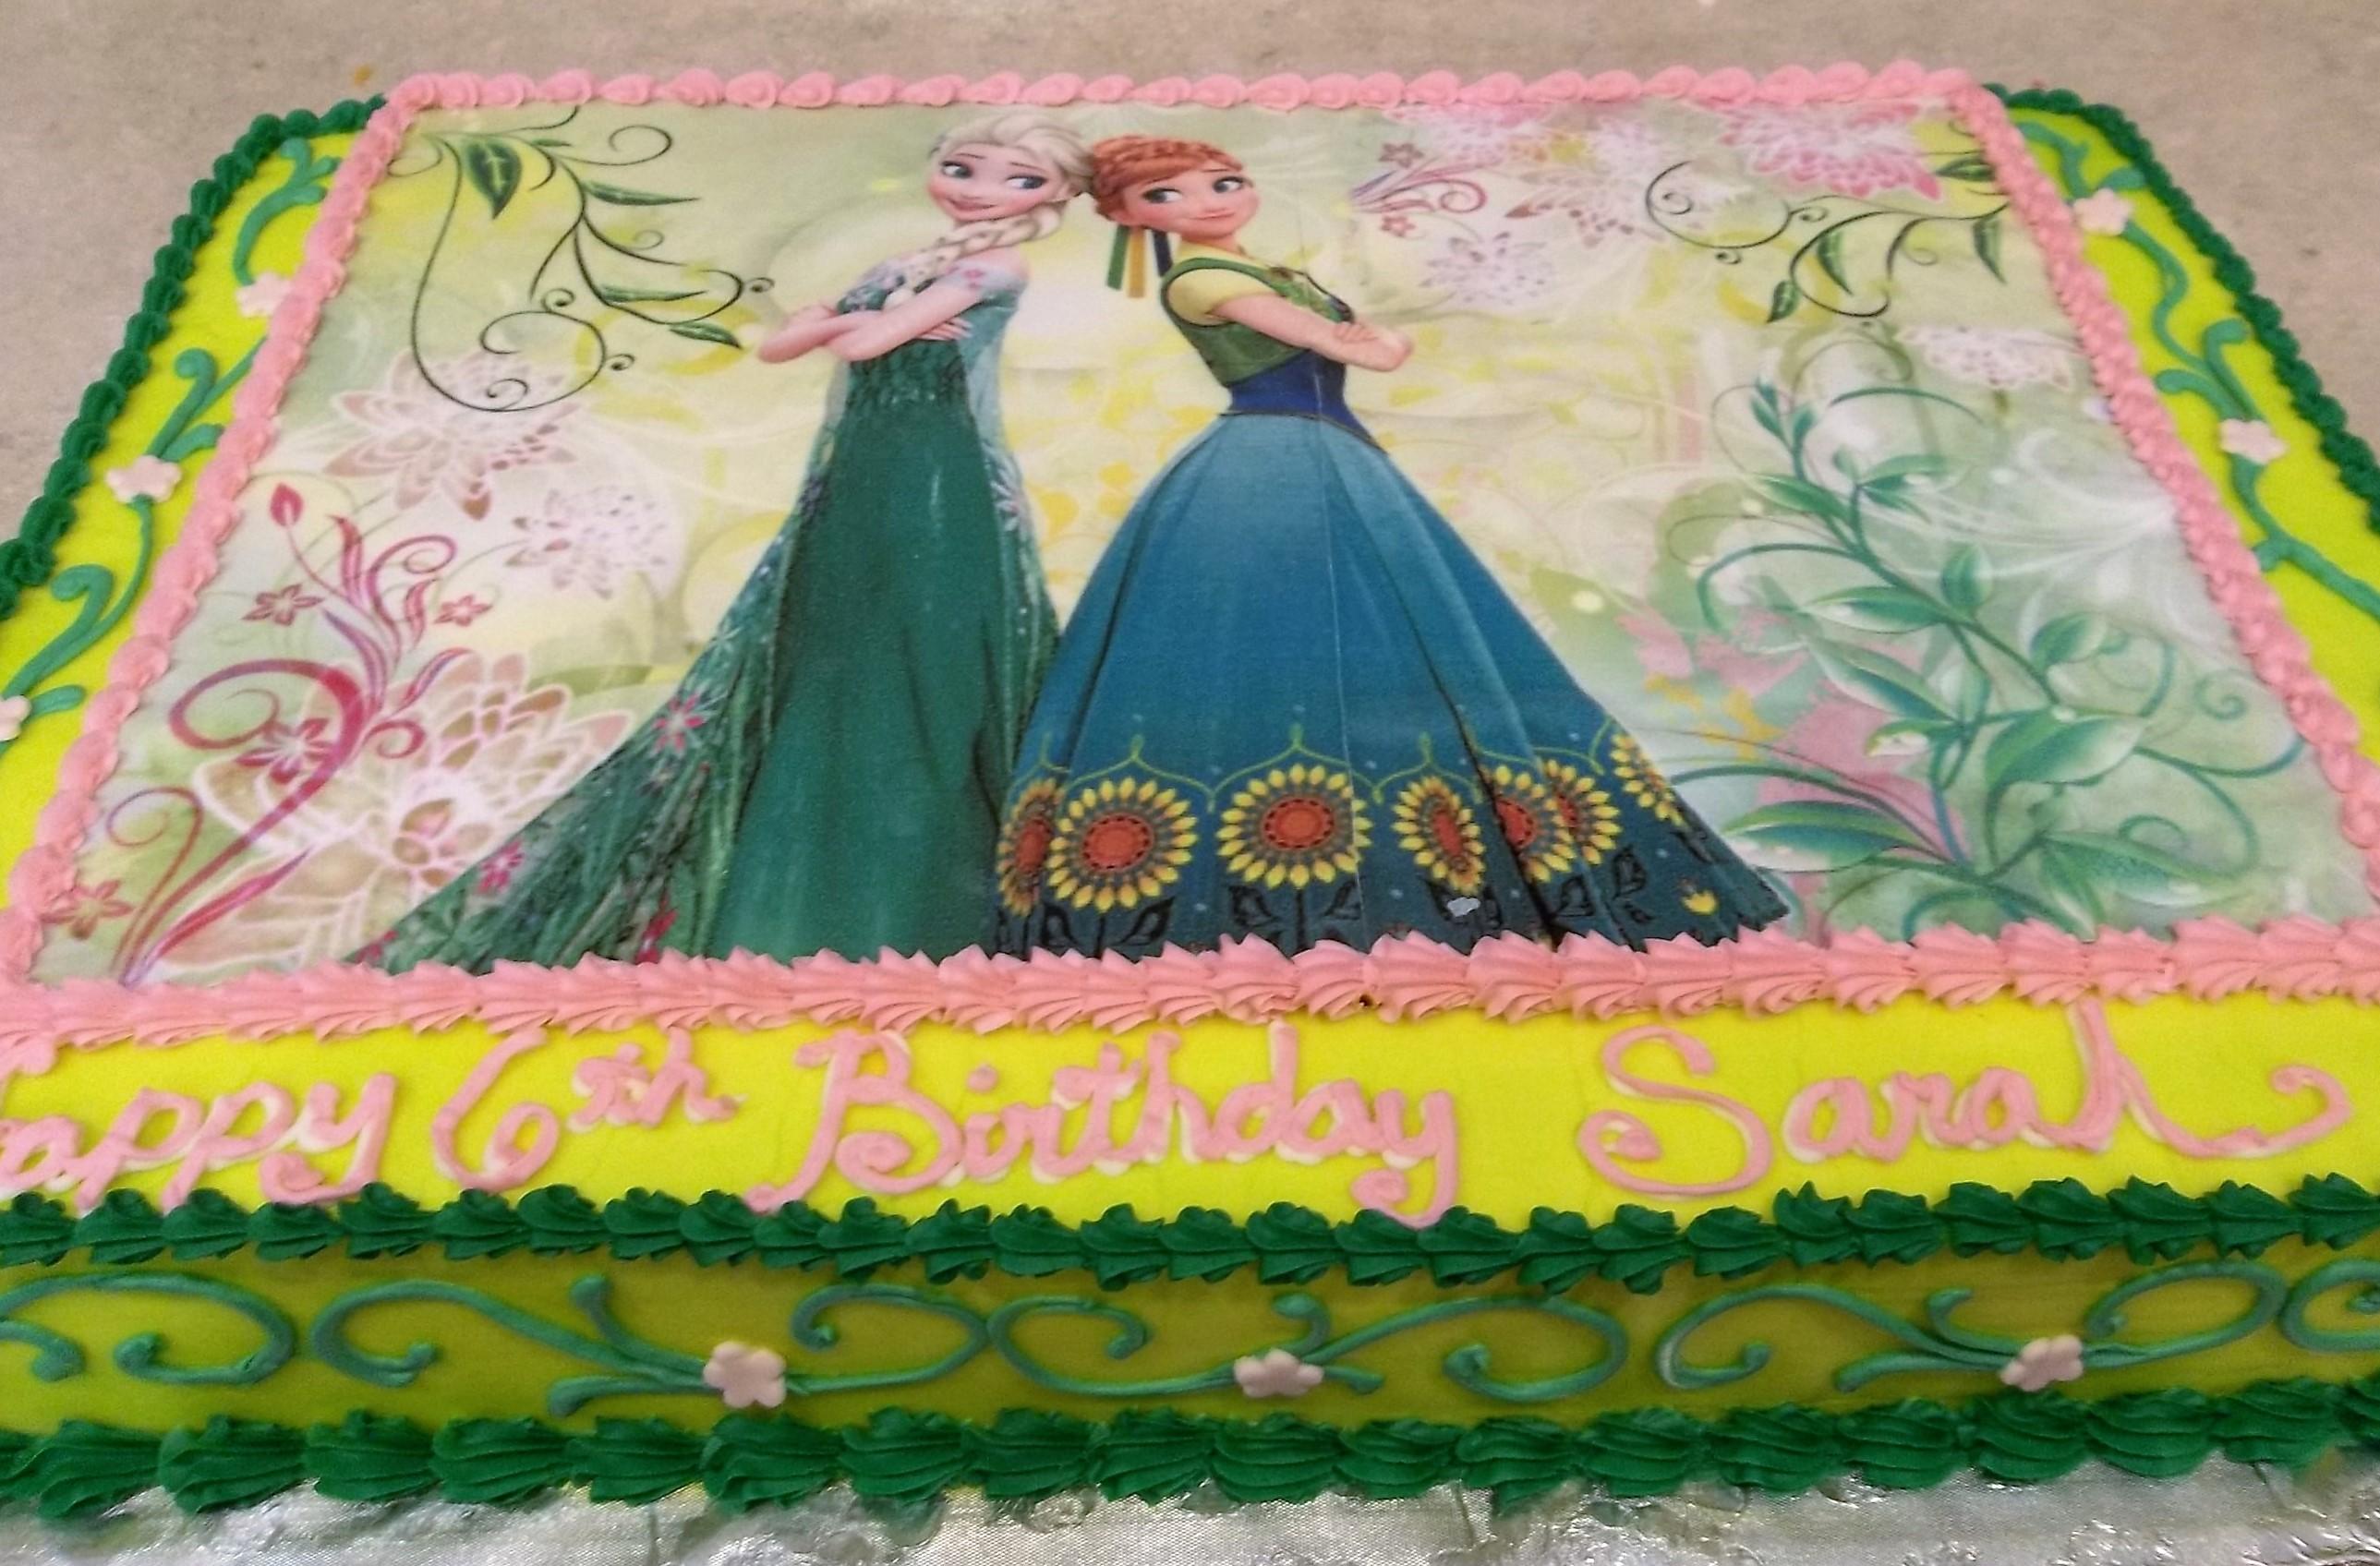 Elsa & Anna edible image